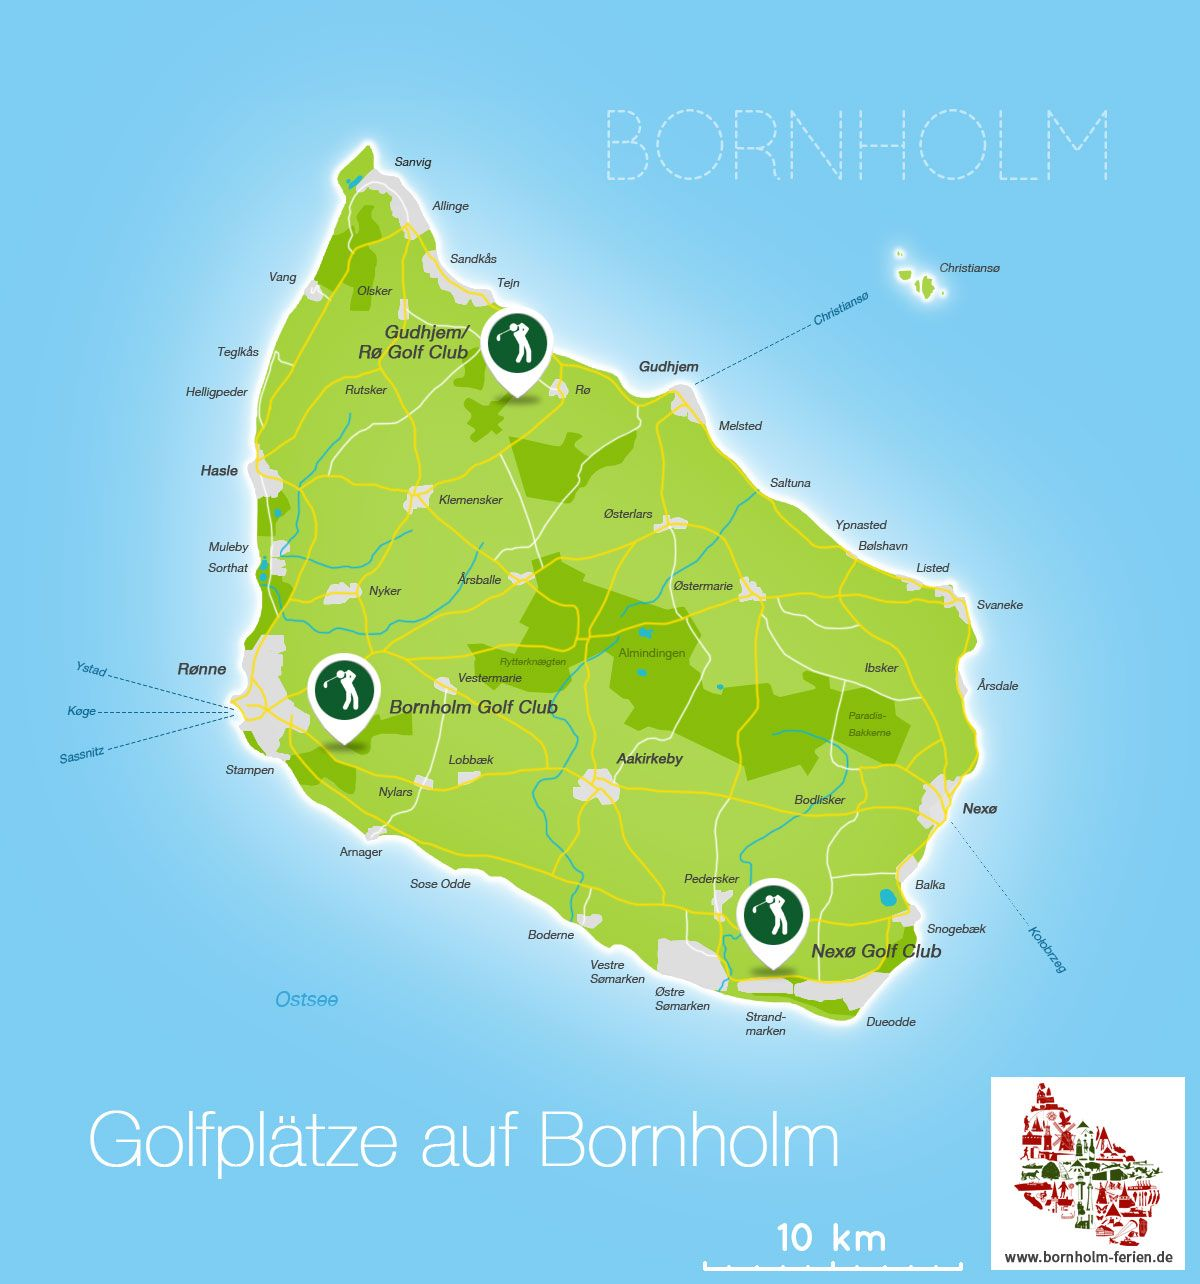 Golfplatze Auf Bornholm Golf Golfplatze Golfcourts Green